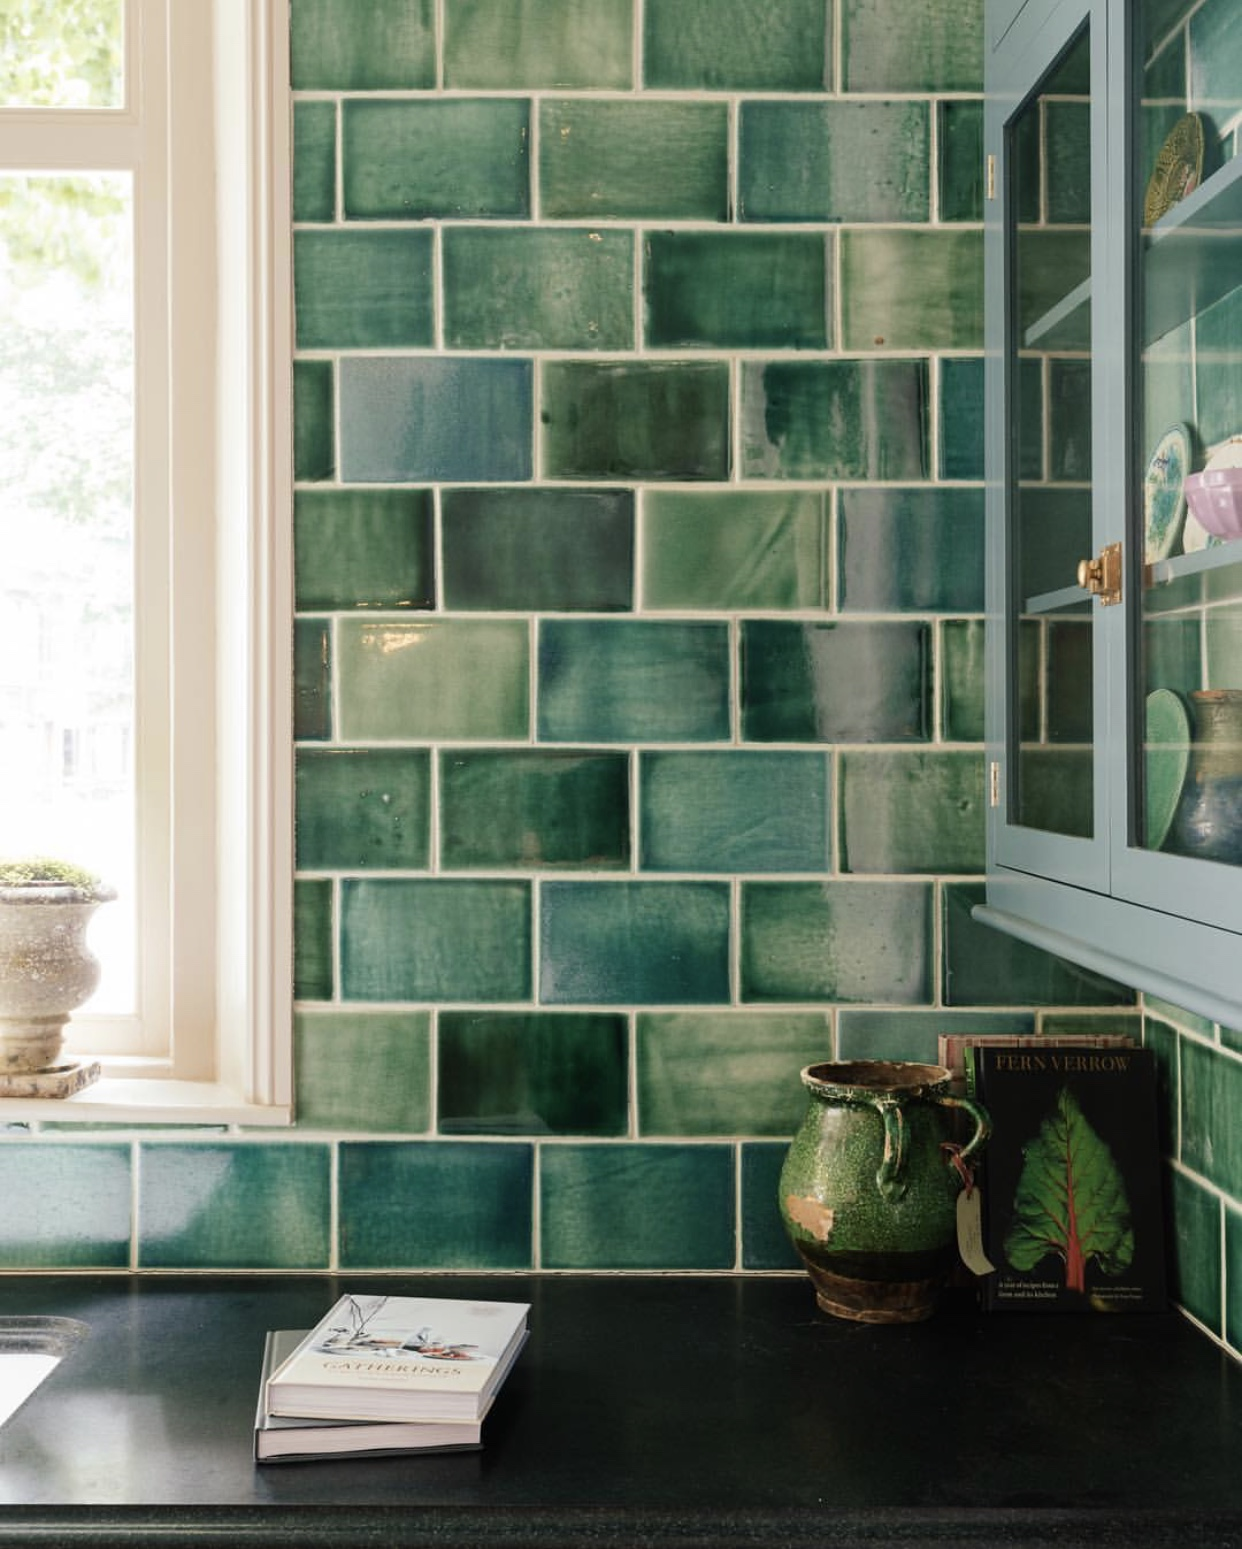 deVOL Emerald Green London Tiles    - Devol Kitchens £25 per tile